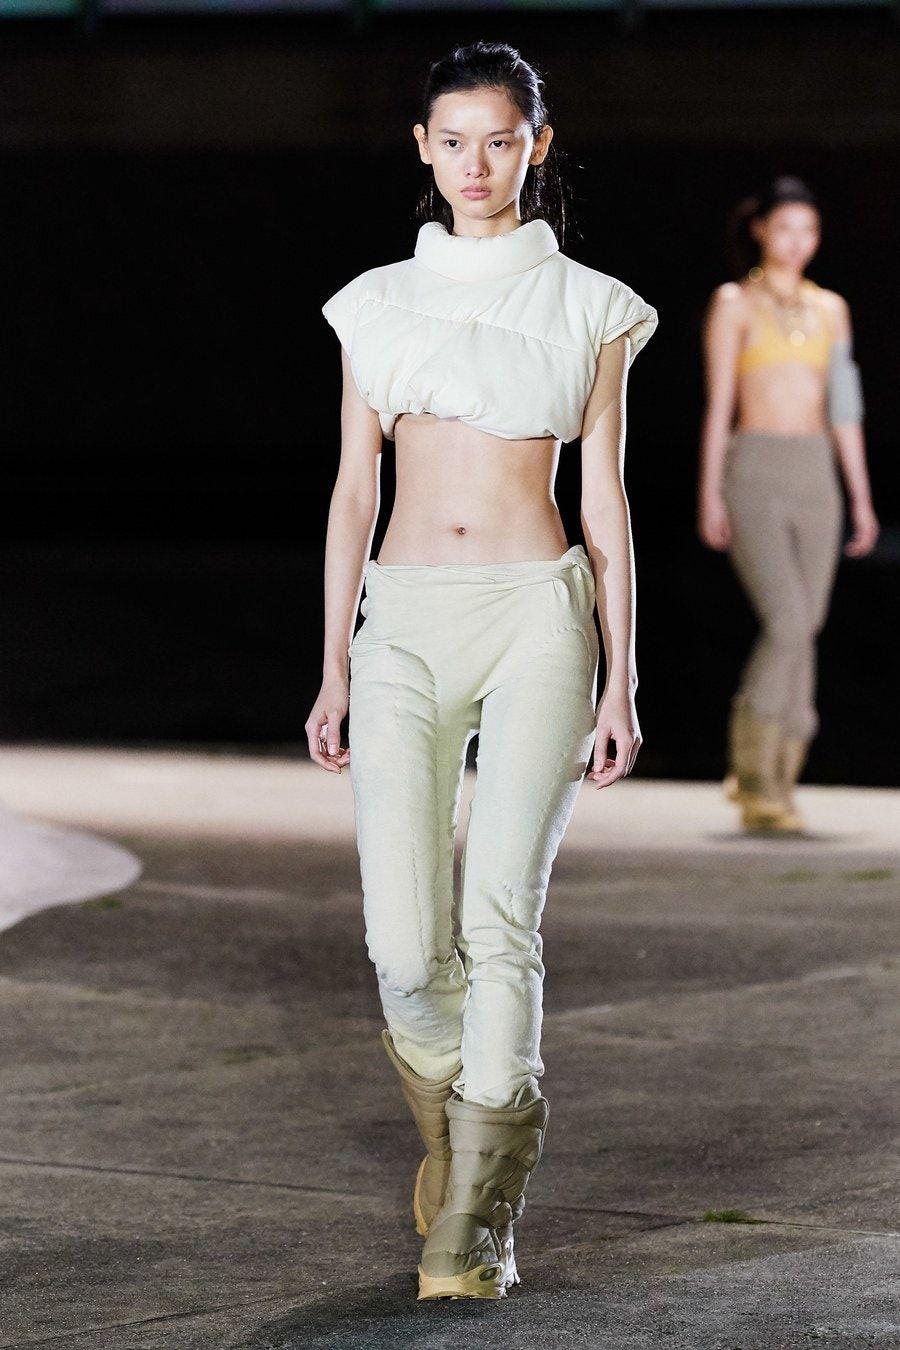 Yeezy Fall 2020 Ready To Wear Fashion Show In 2020 Fashion Week Crowd Fashion Ready To Wear